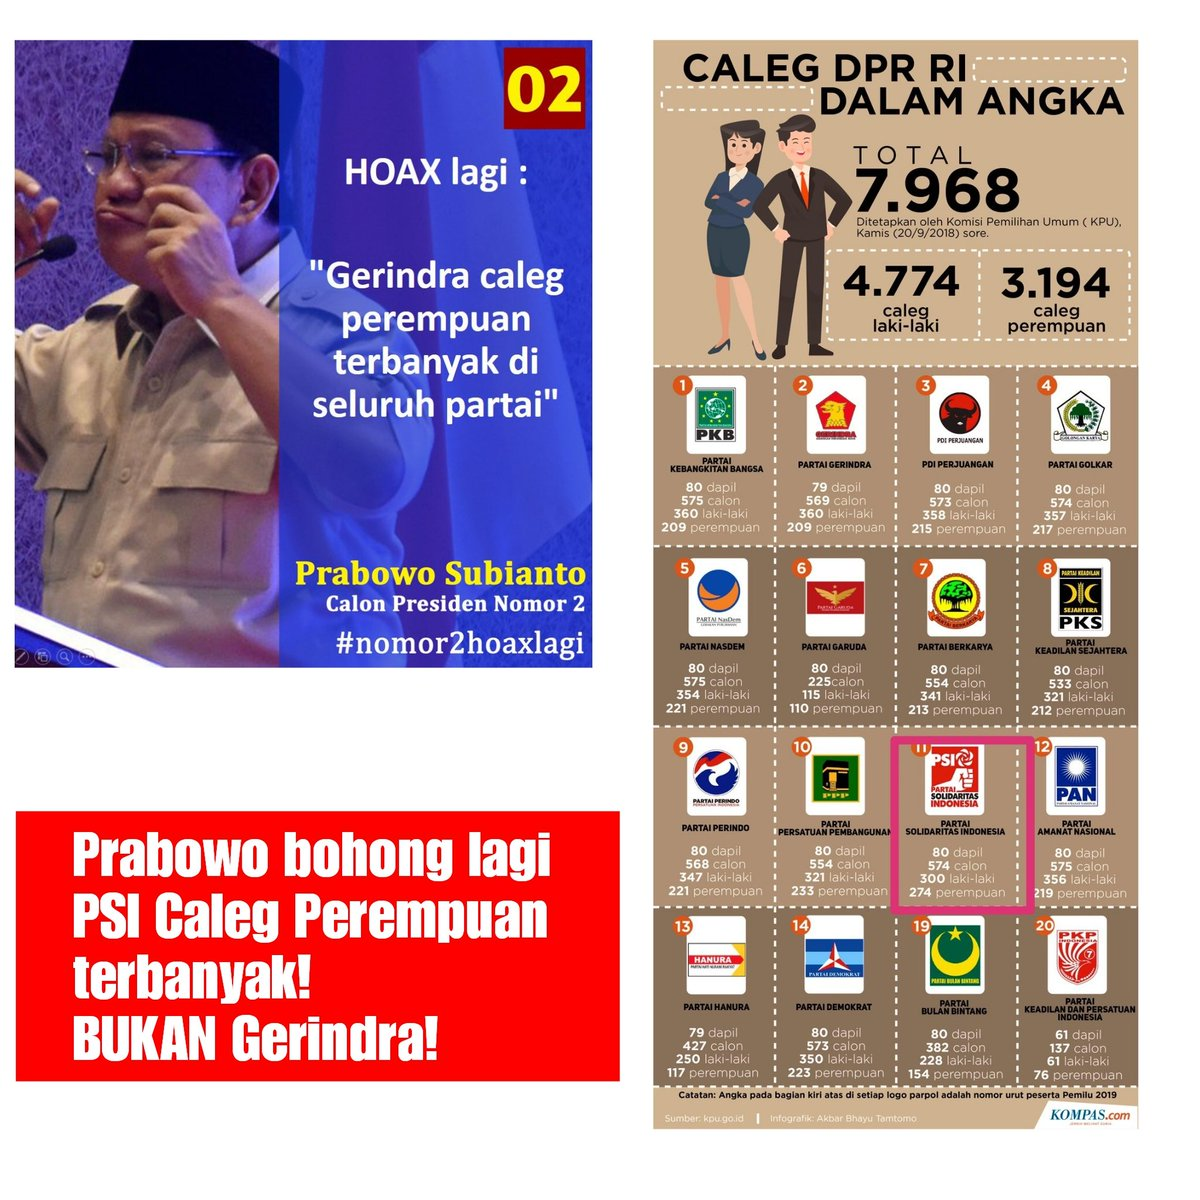 Saya kasi data ke @prabowo soal Caleg Perempuan terbanyak agar tidak bohong lagi... #JokowiAminMenangDebat